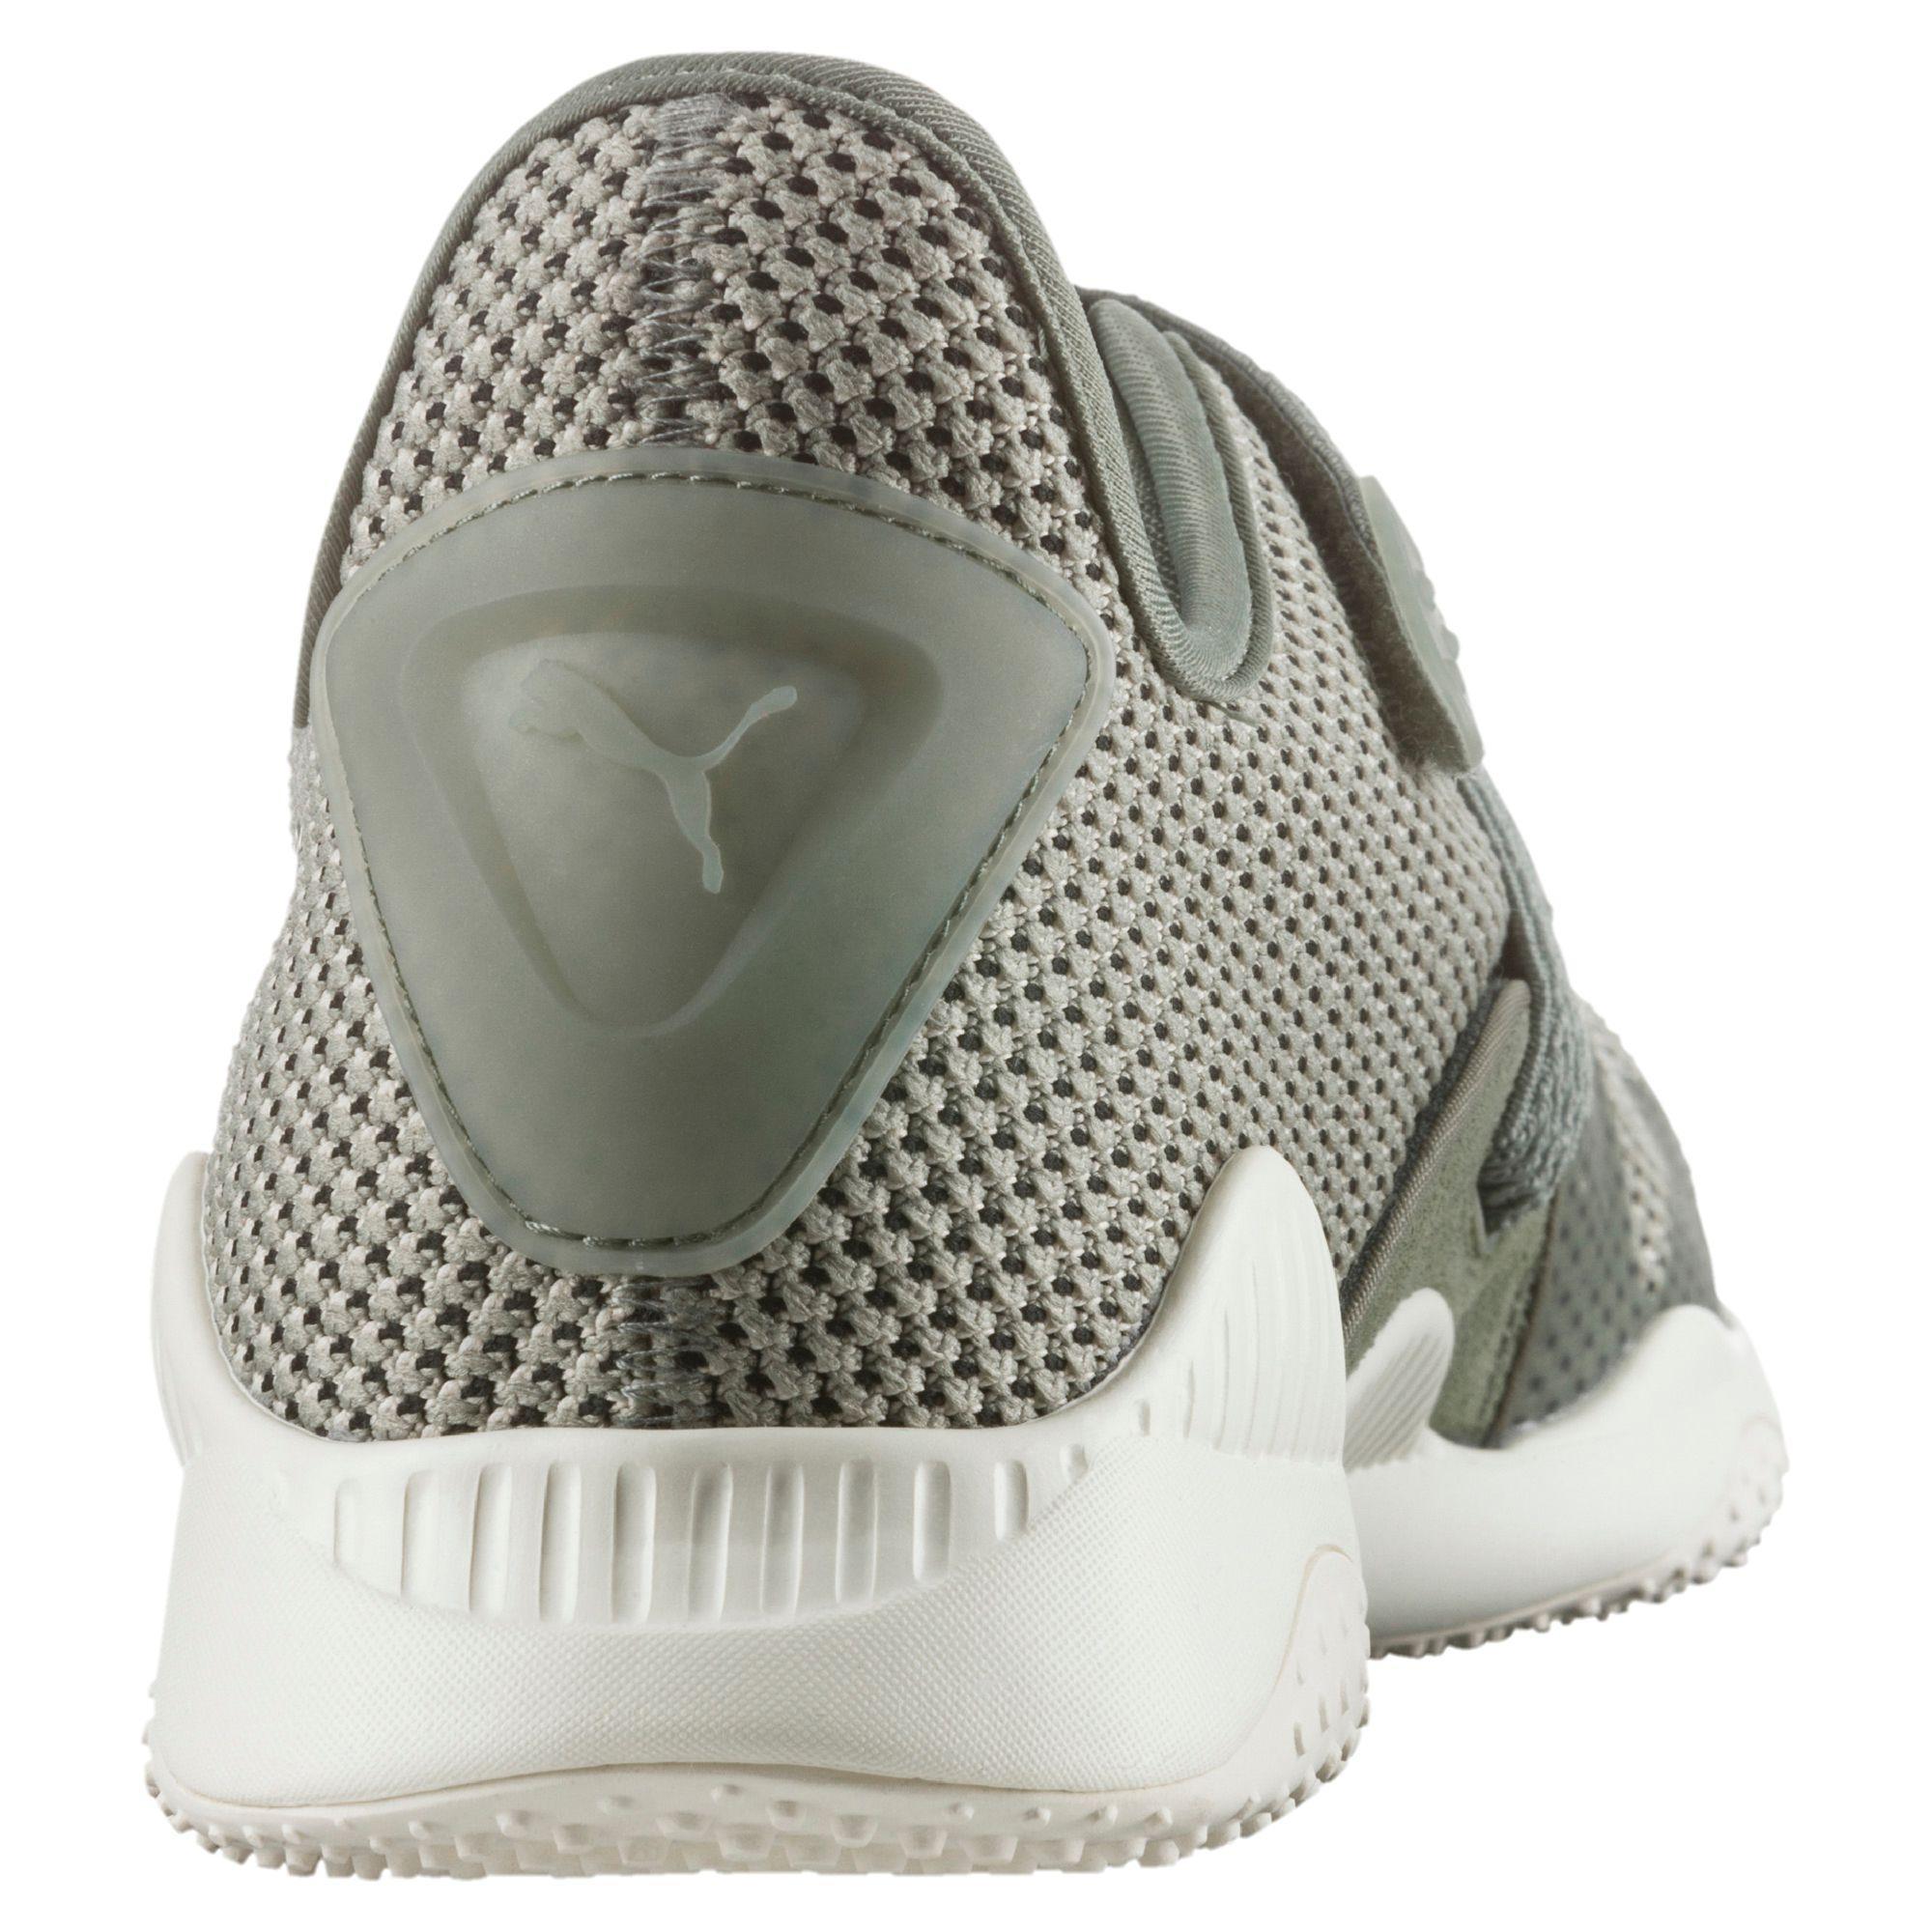 Lyst - PUMA Evolution Mostro Breathe Training Shoes for Men 76ab5e74d